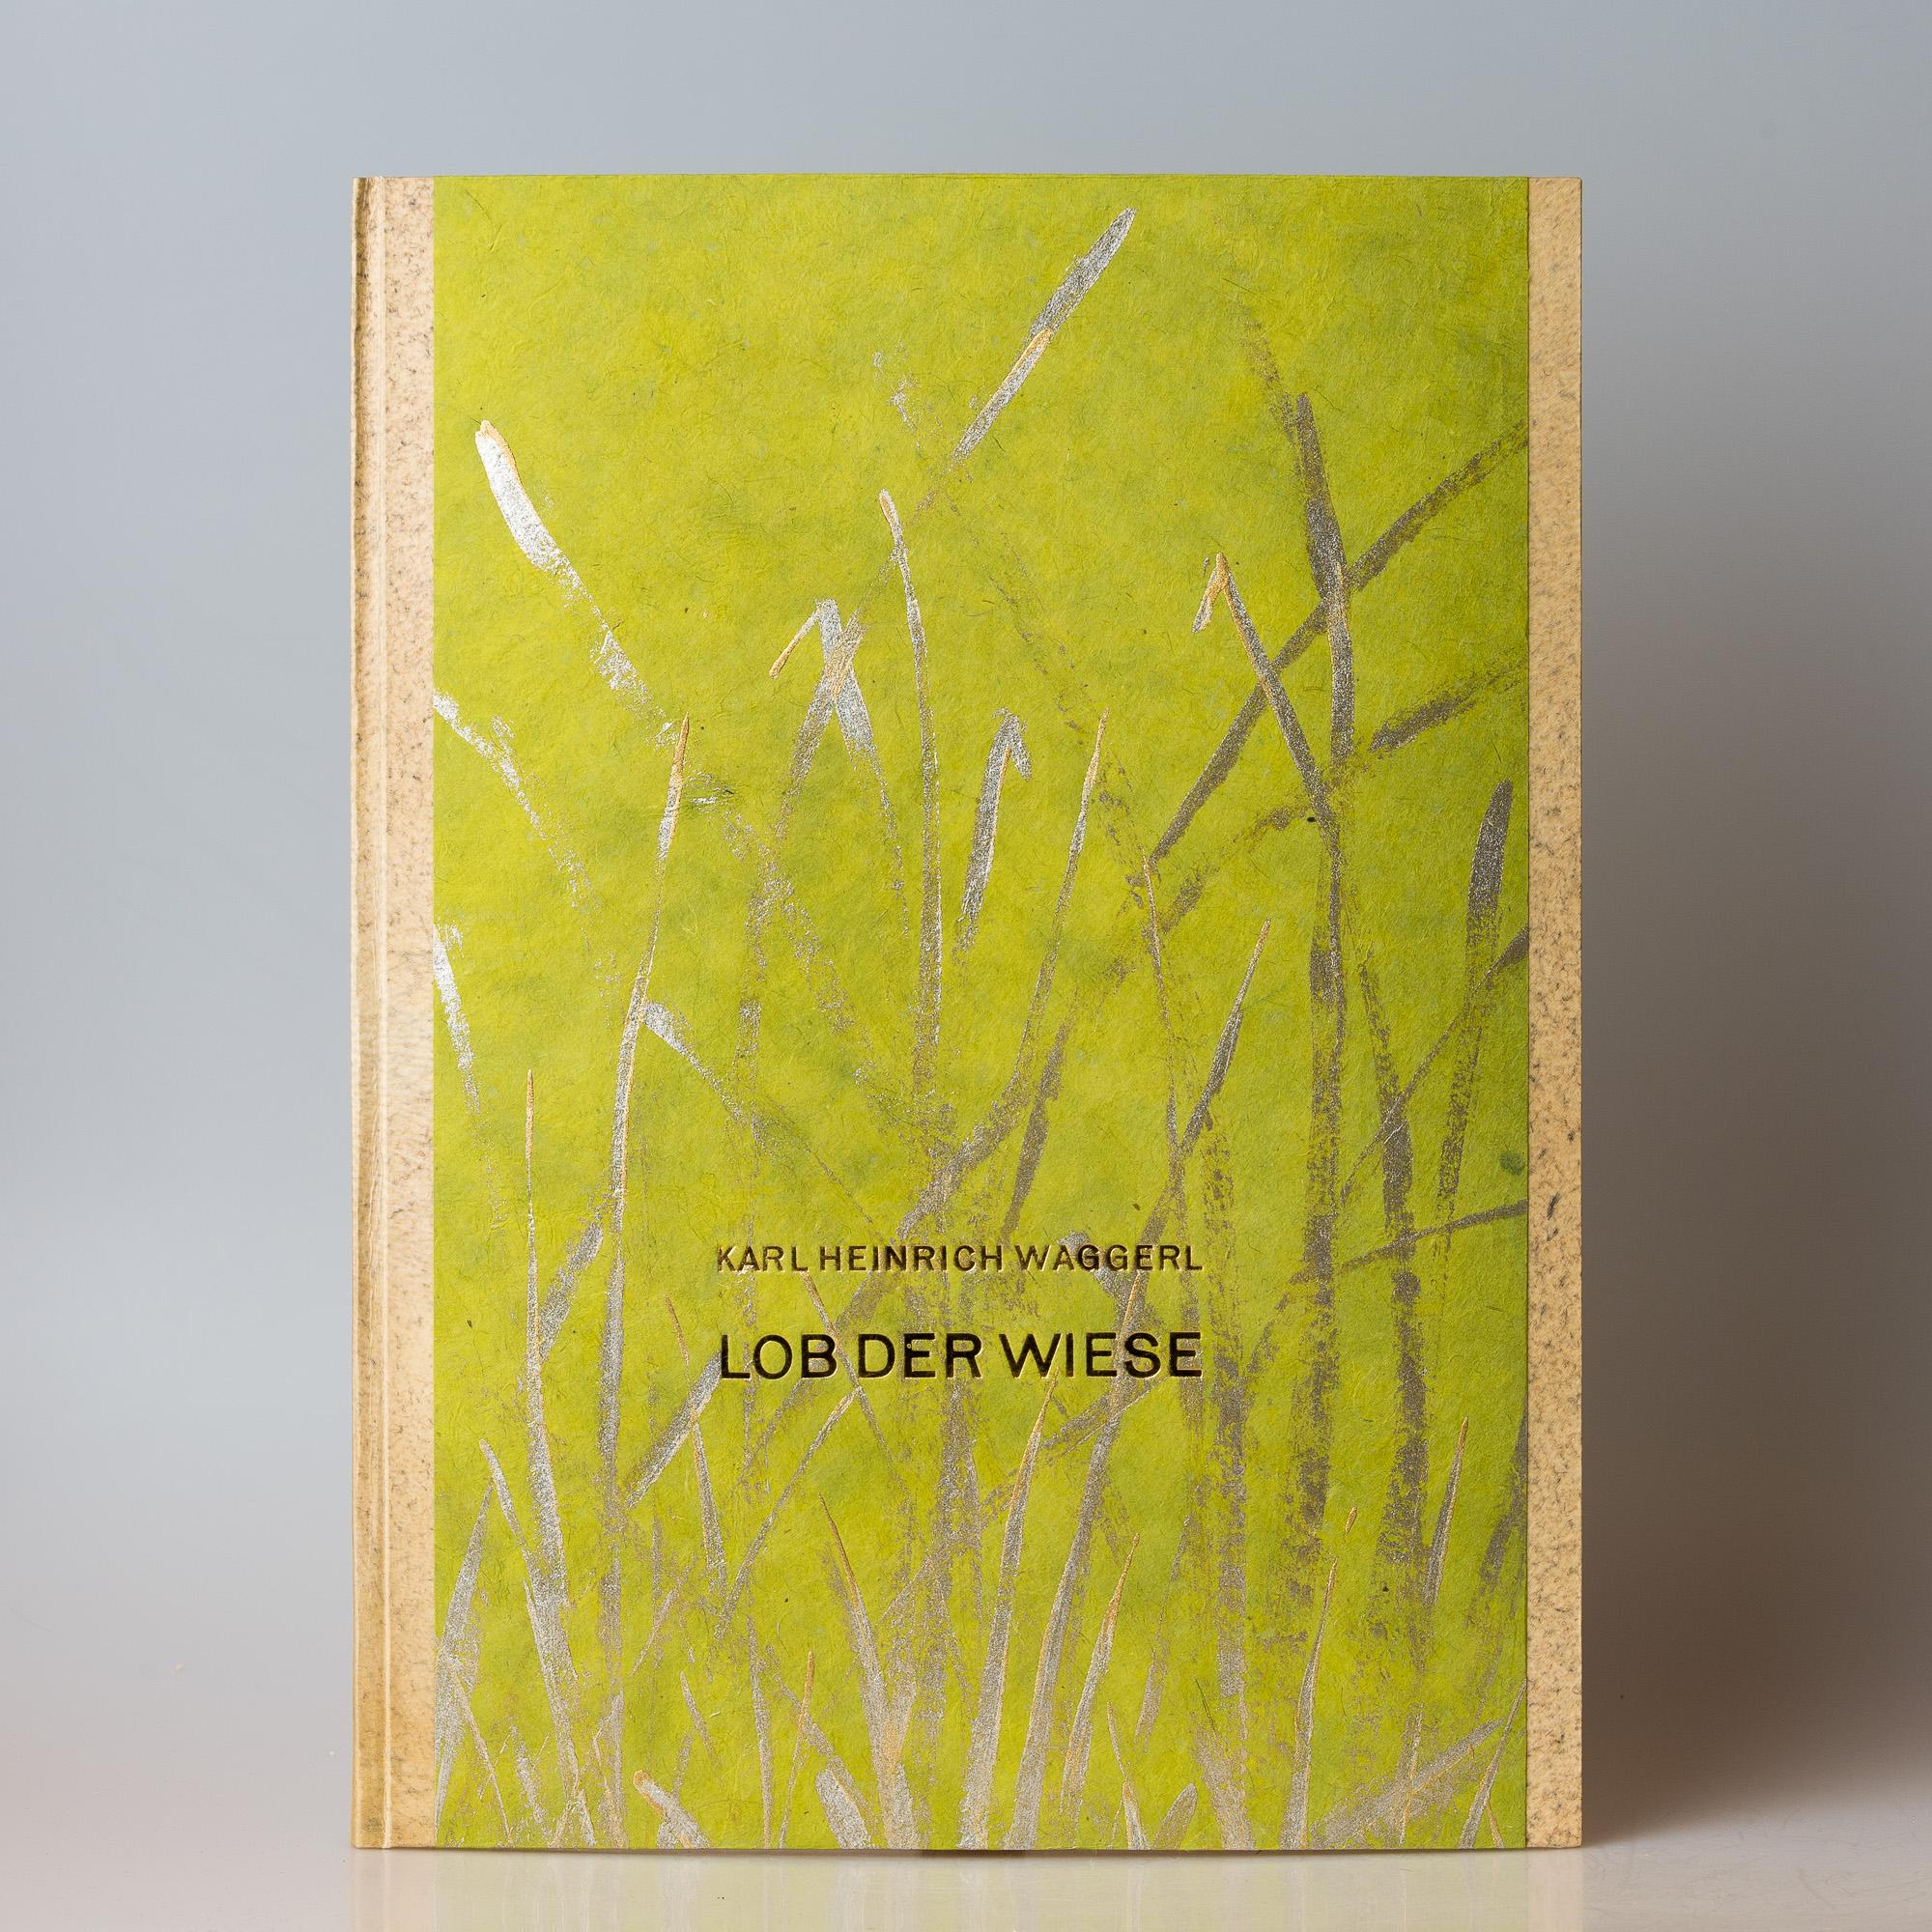 Lob der Wiese, Waggerl, Halbpergamentband,  verkauft